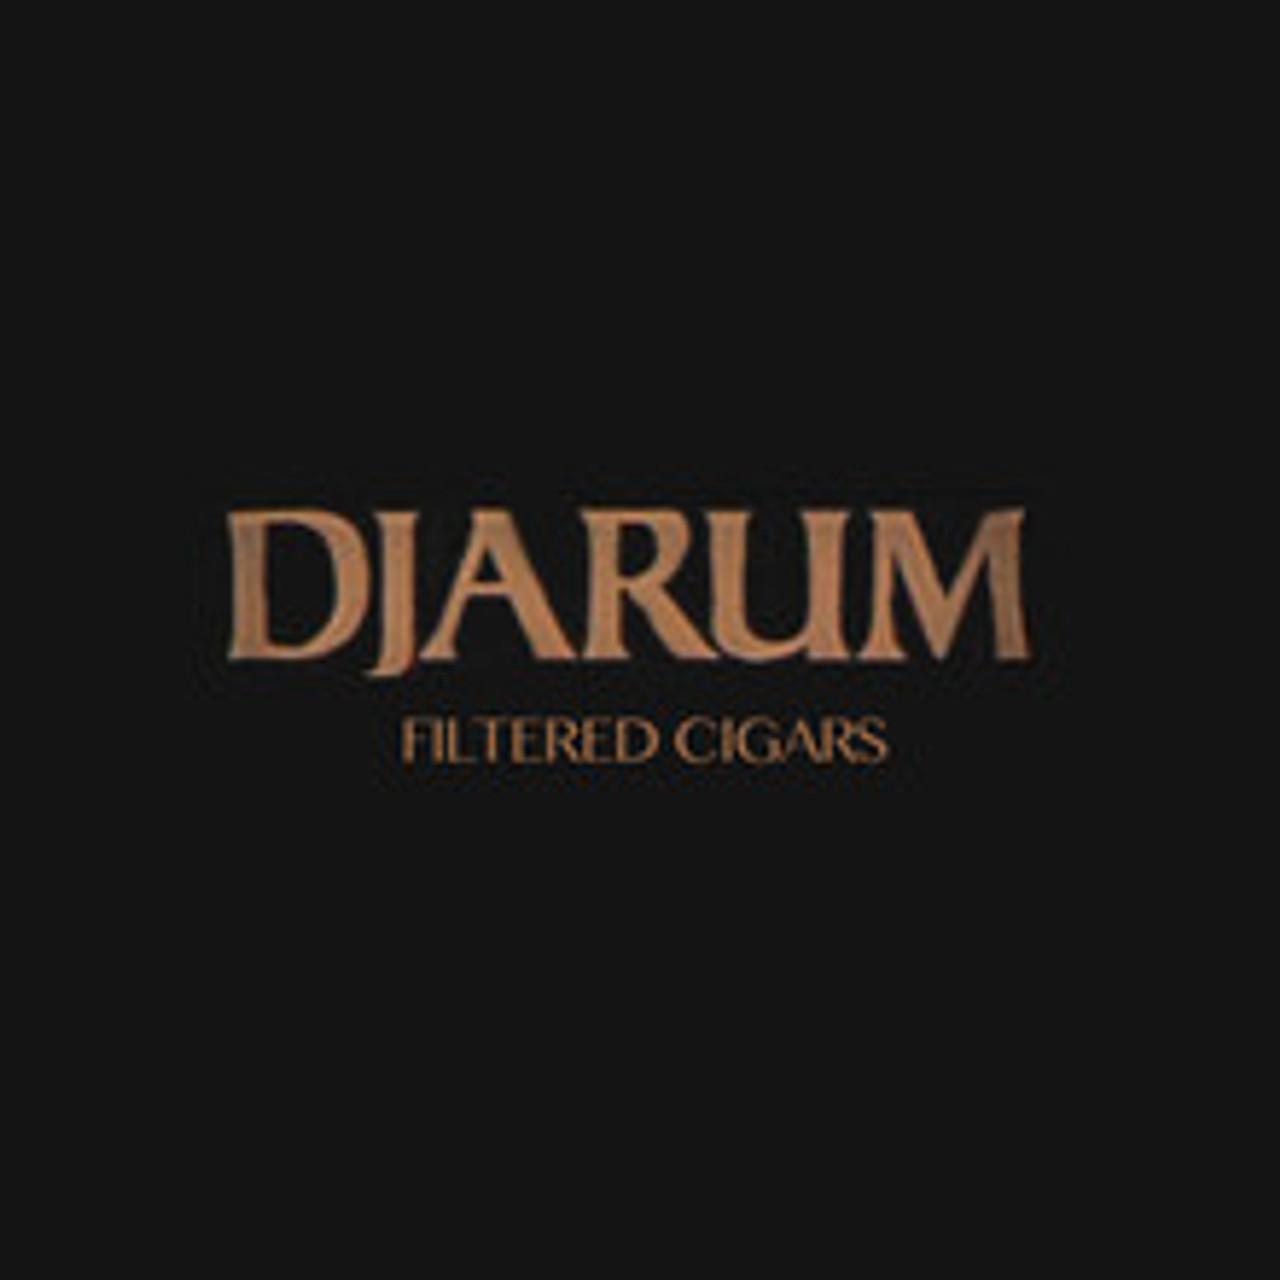 Djarum Filtered Black Cigars (10 Packs of 12)  - Maduro